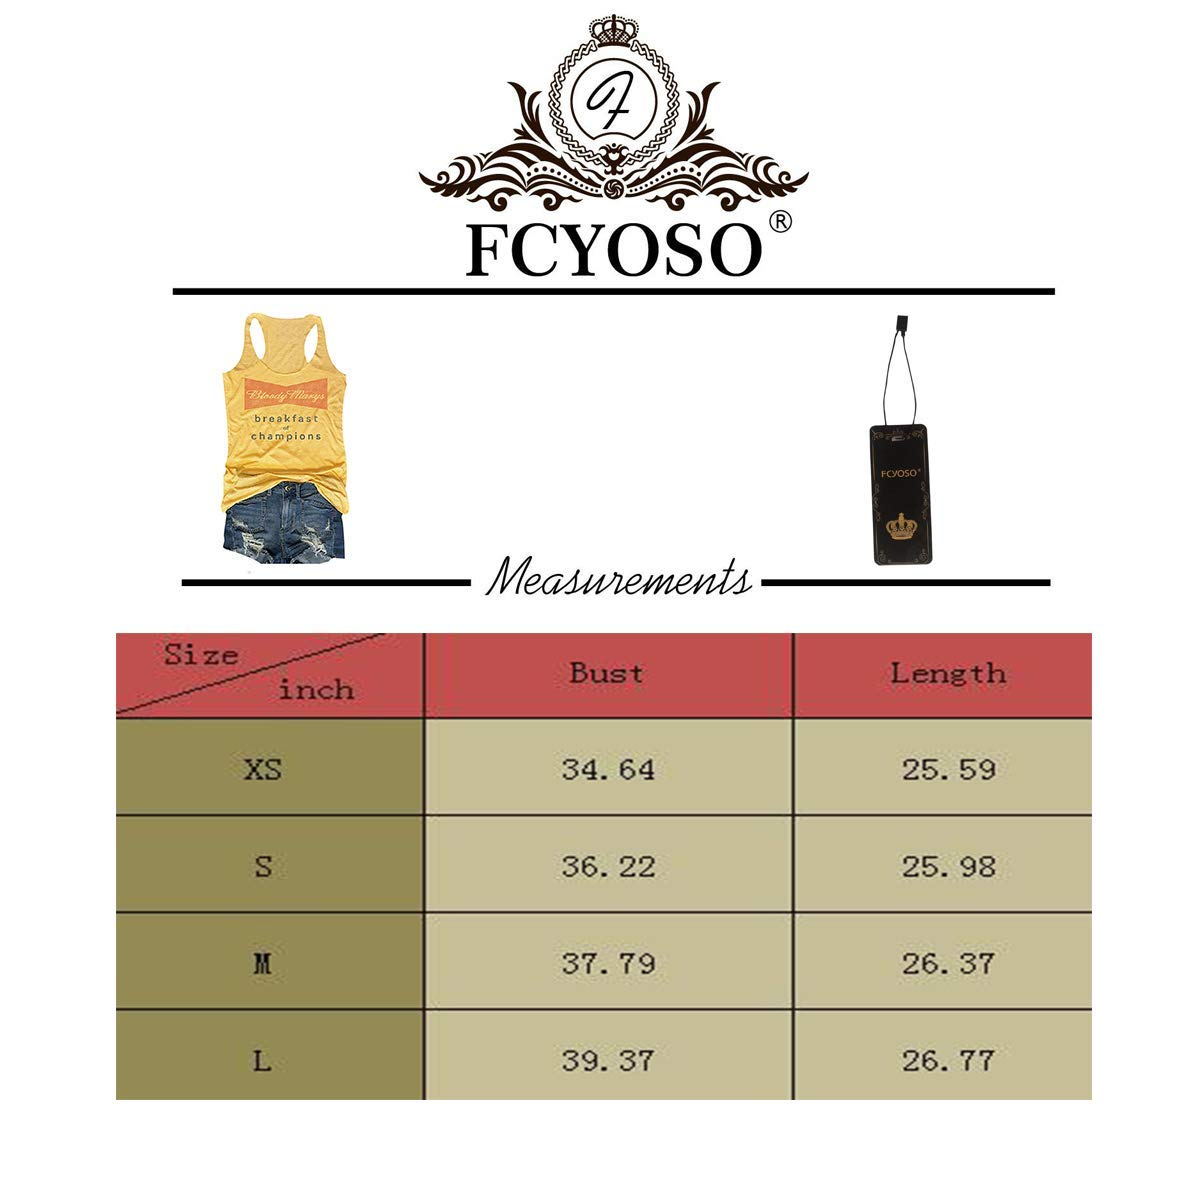 Amazon.com: FCYOSO - Camiseta de manga corta para mujer ...